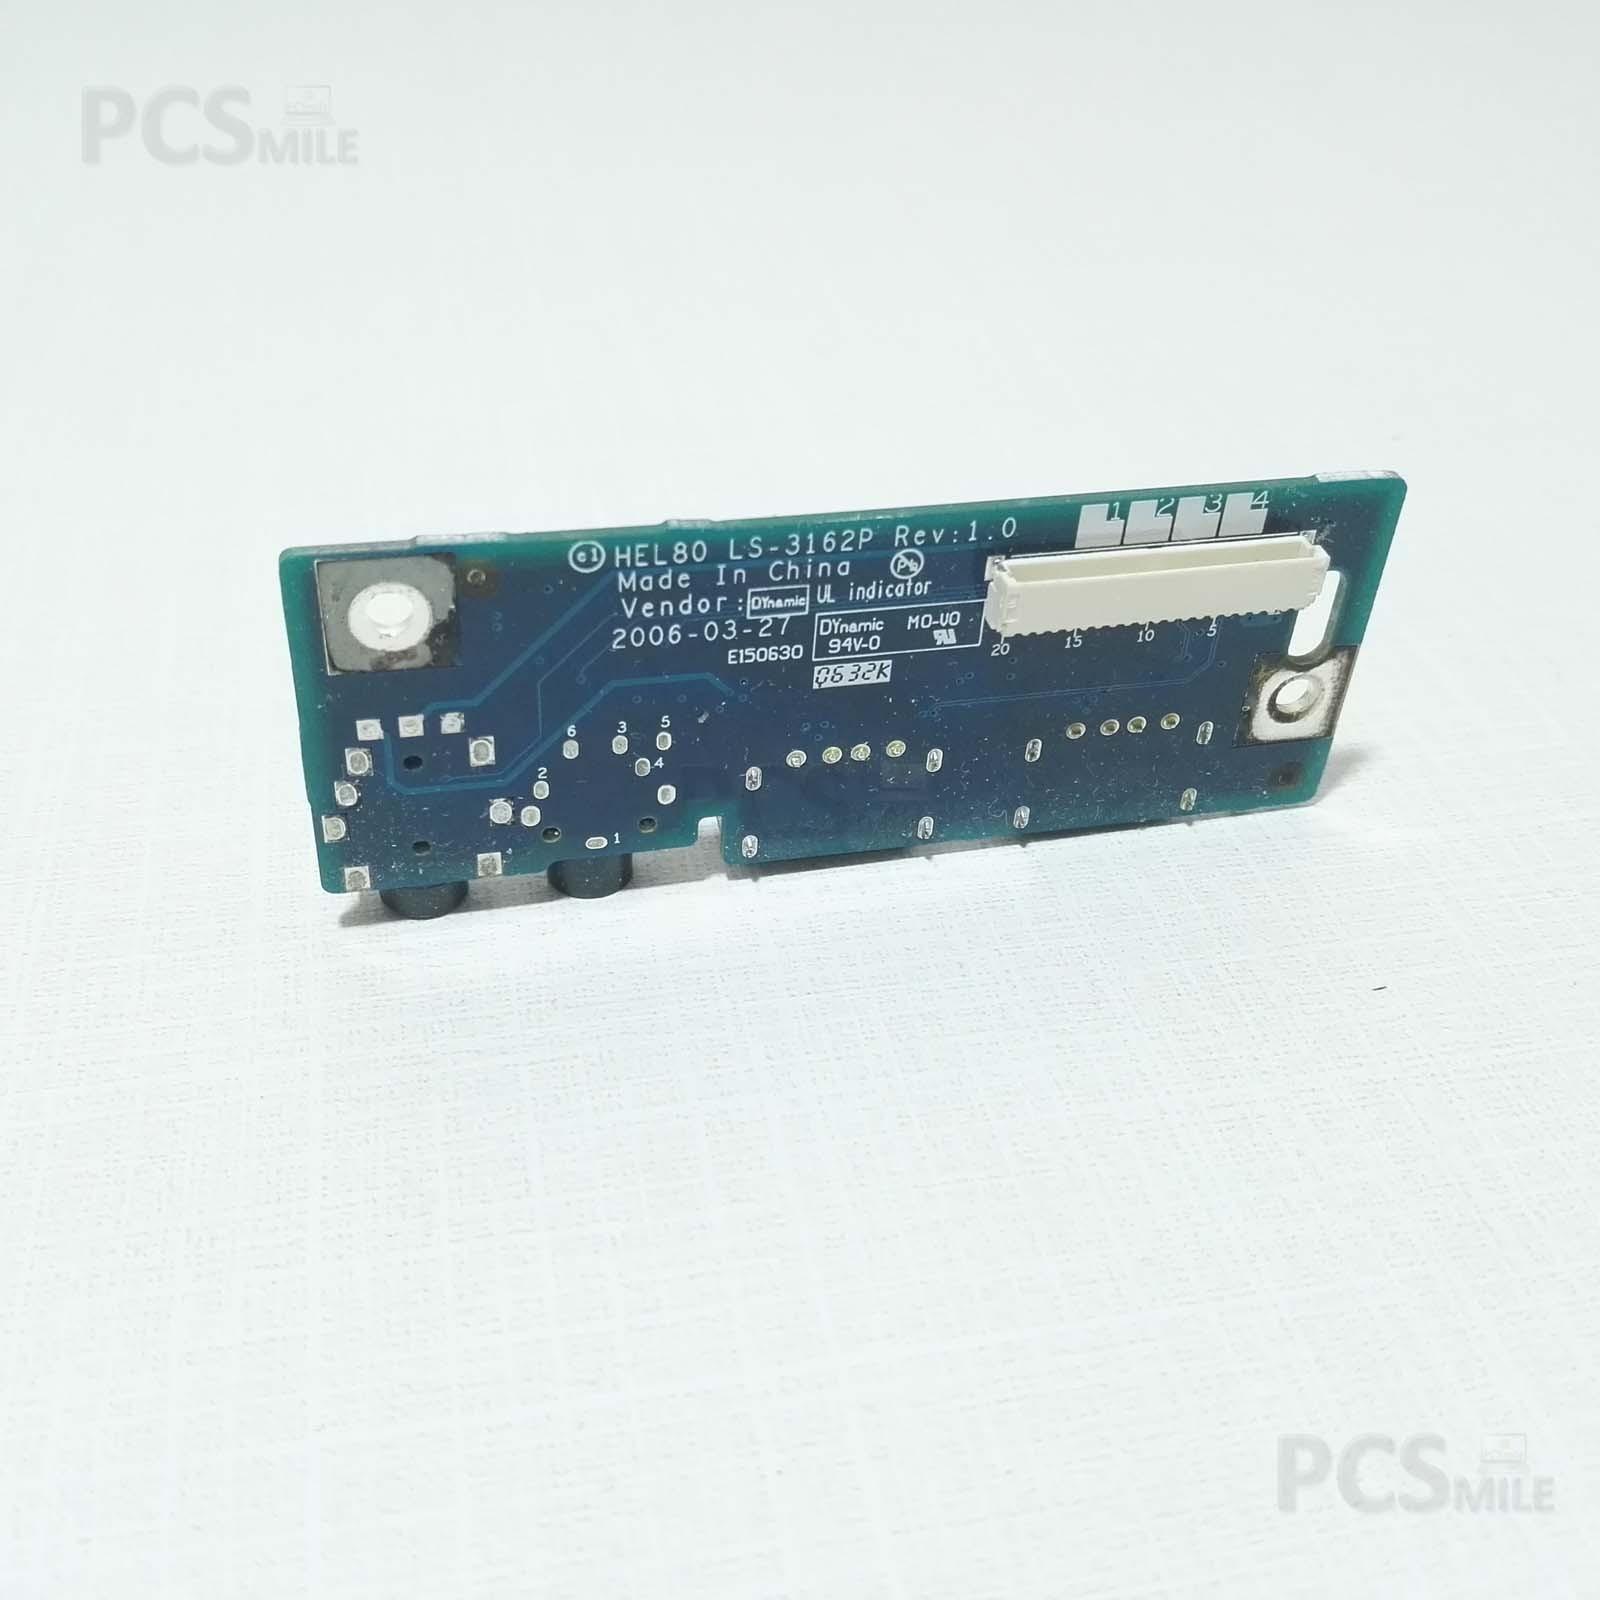 Scheda audio USB Olidata tehom CW4800 HEL80 LS-3162P, 455BE80L01